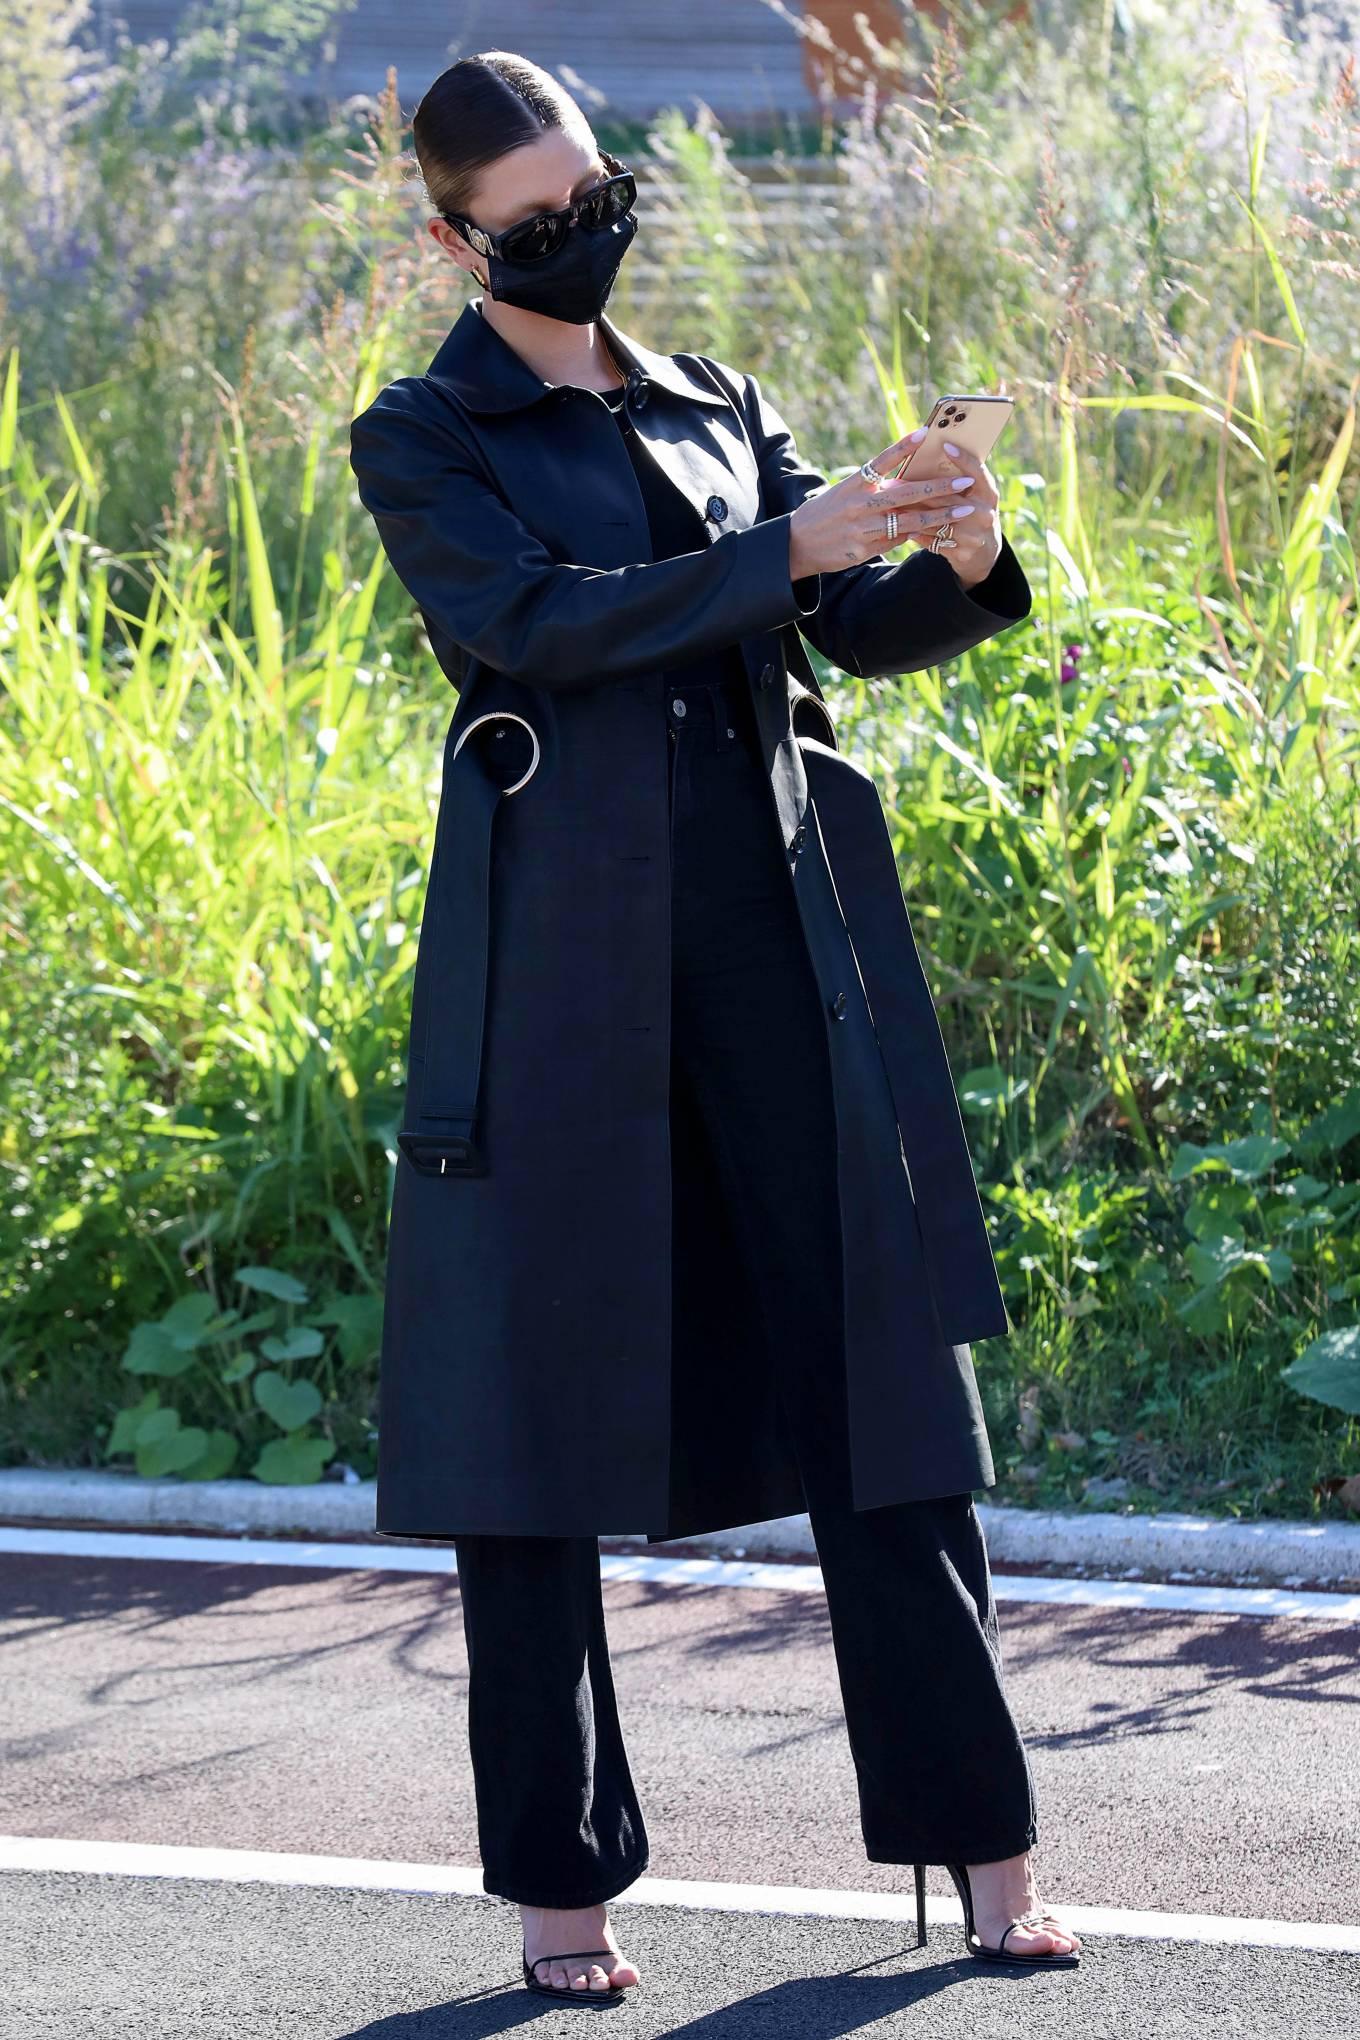 Hailey Bieber - Taking pictures in front of her Versace billboard in Milan